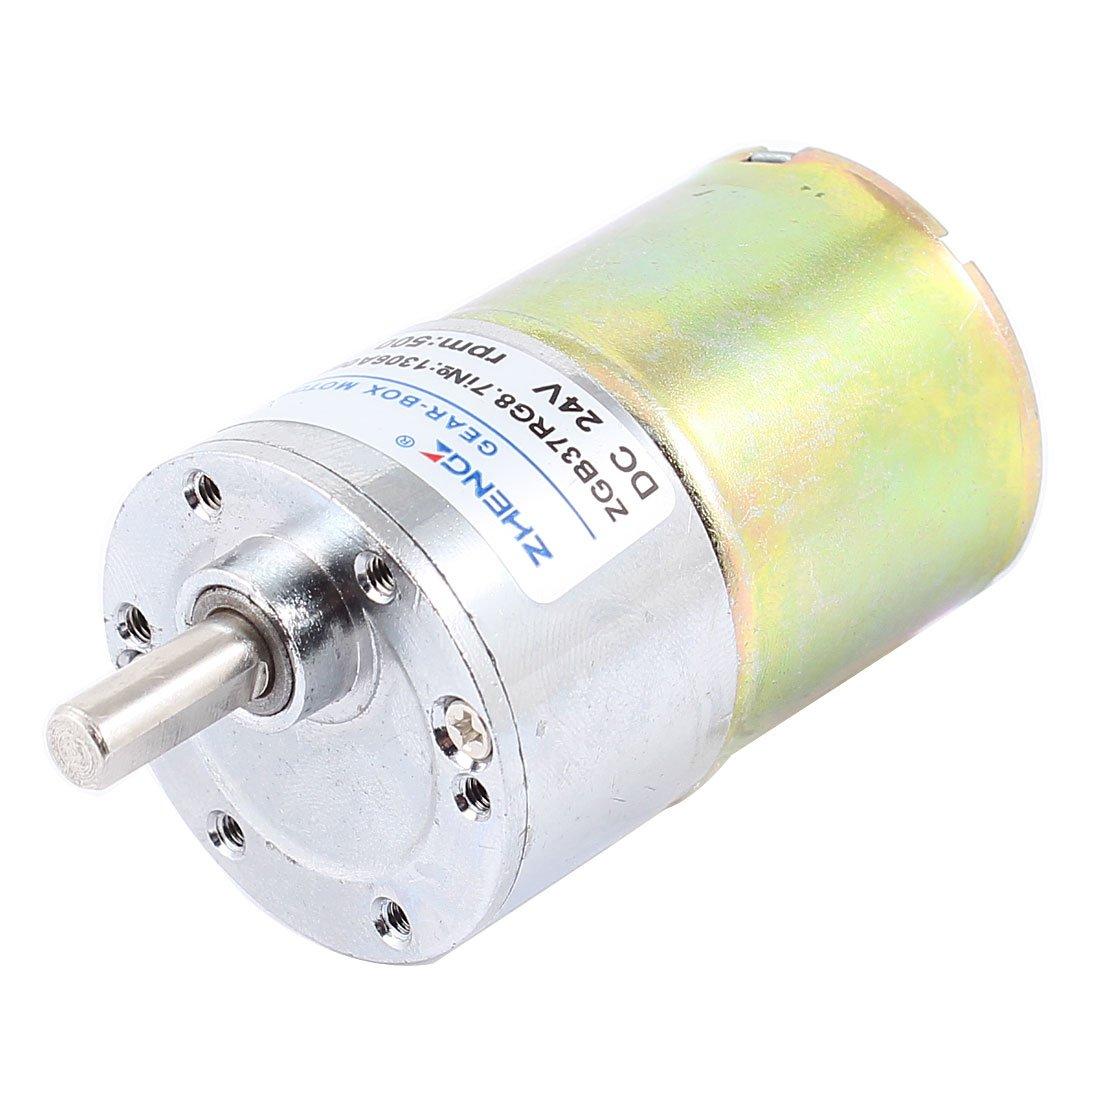 DC 24V 0.33A 37mm Dia Magnetic Gear Geared Box Motor 500 RPM